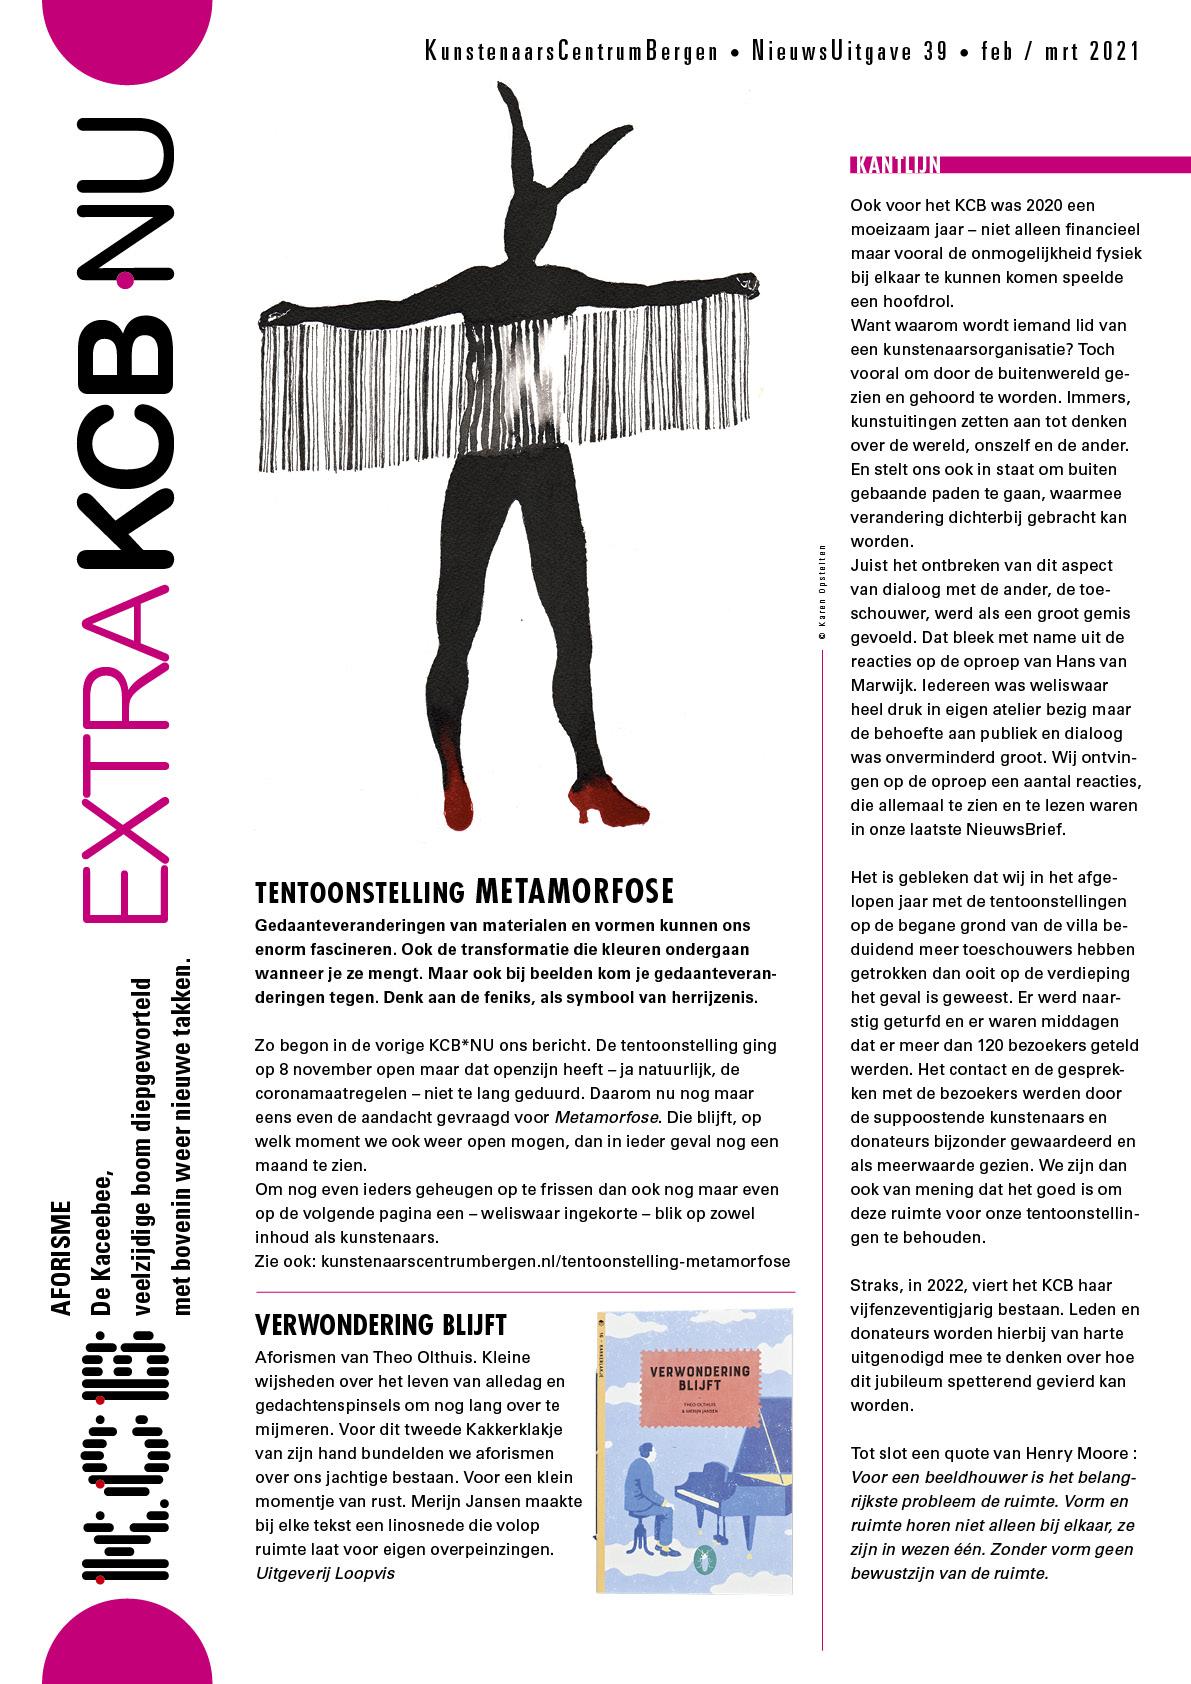 KCB NU EXTRA NR 39